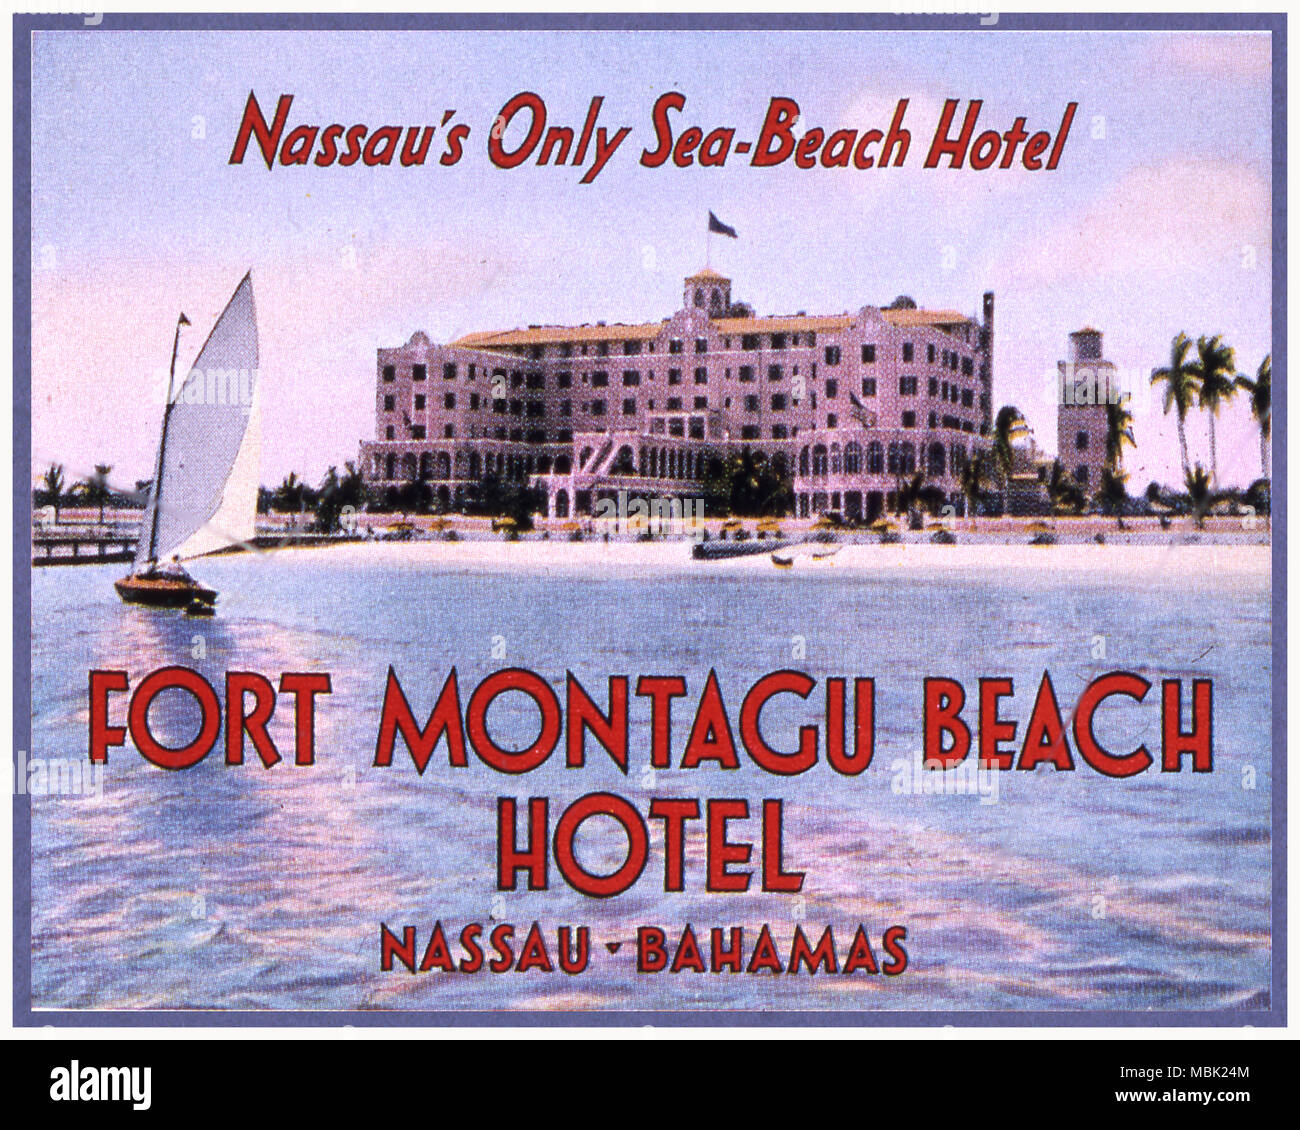 Fort Montagu Beach Hotel - Stock Image